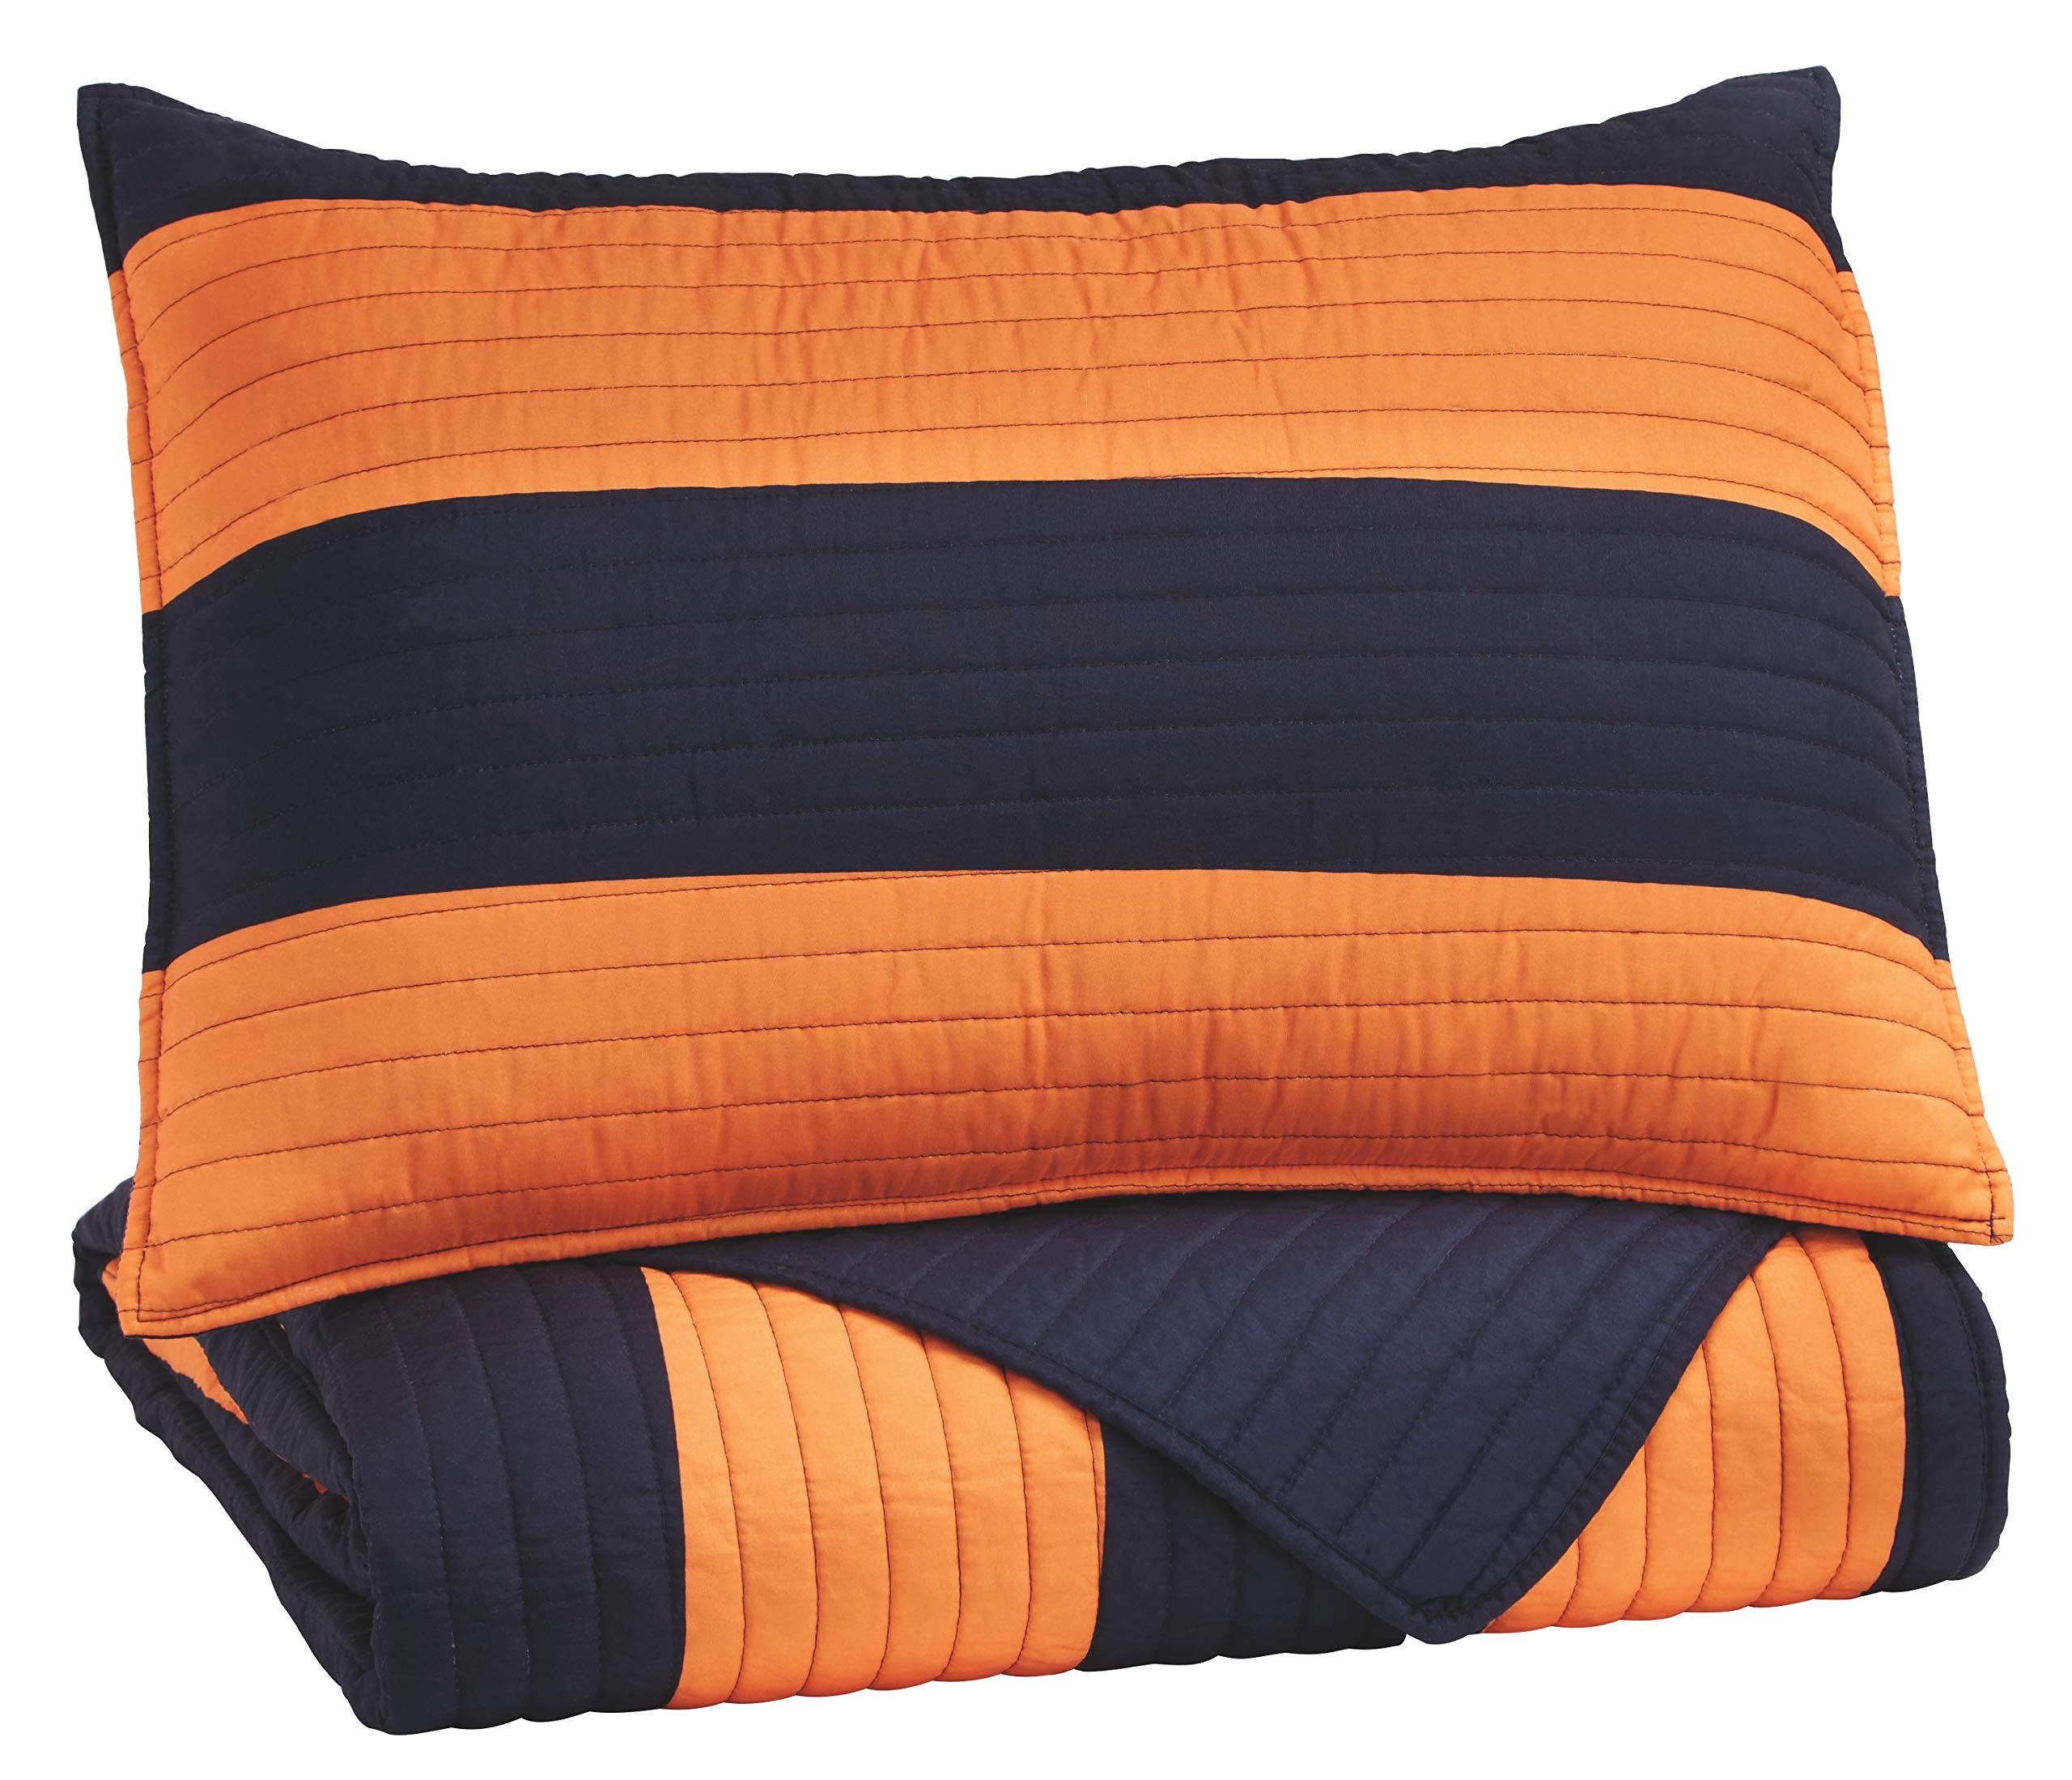 Ashley Furniture Signature Design - Nixon Coverlet Set - Twin - Youth - Orange/Navy by Signature Design by Ashley